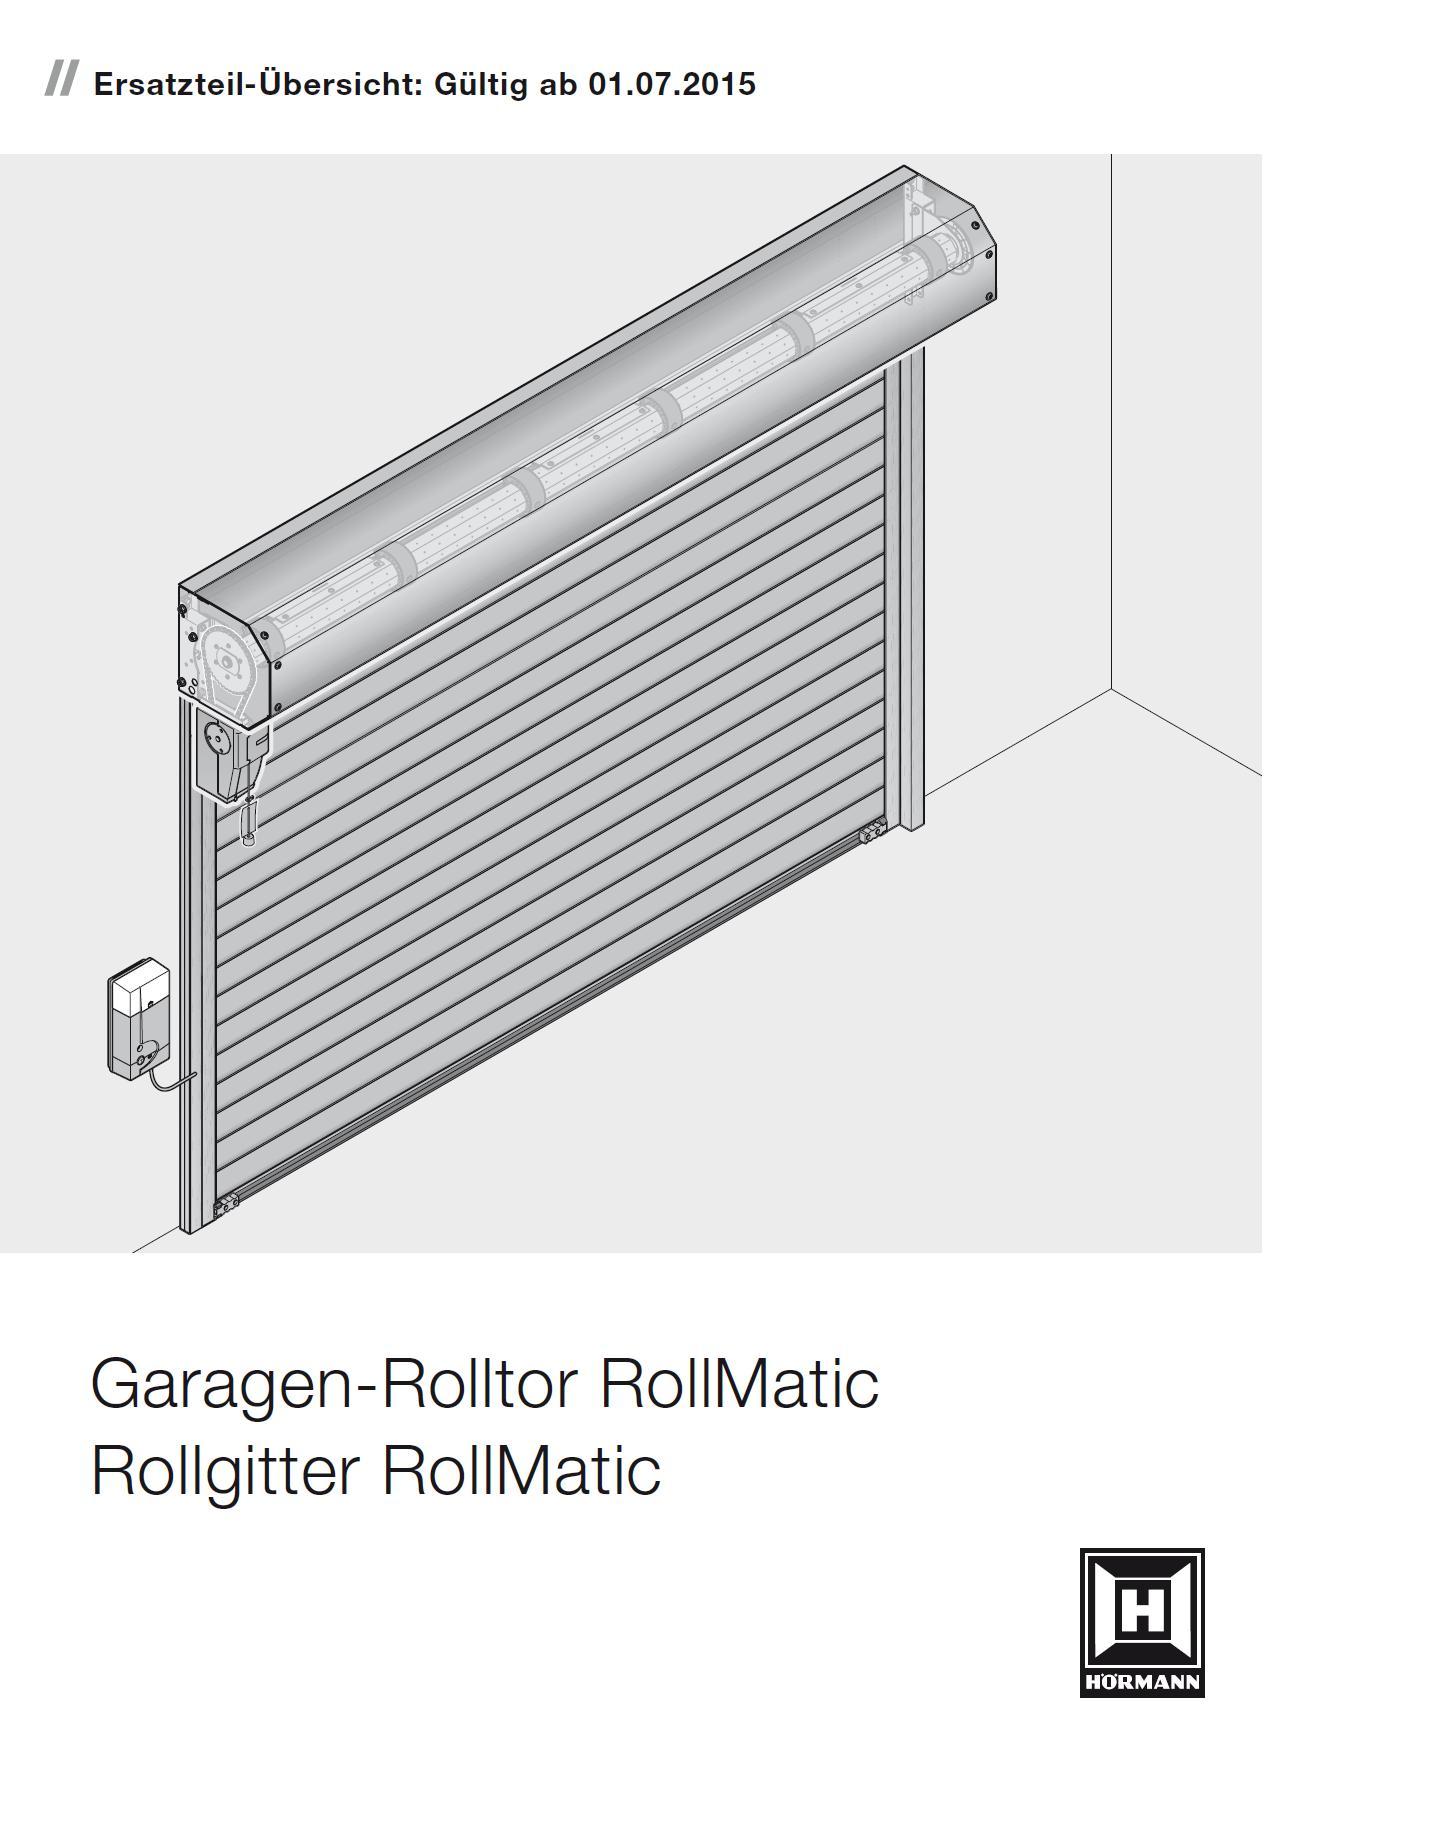 ersatzteile h rmann rolltor und rollgitter rollmatic bei tarotore remscheid solingen und wuppertal. Black Bedroom Furniture Sets. Home Design Ideas